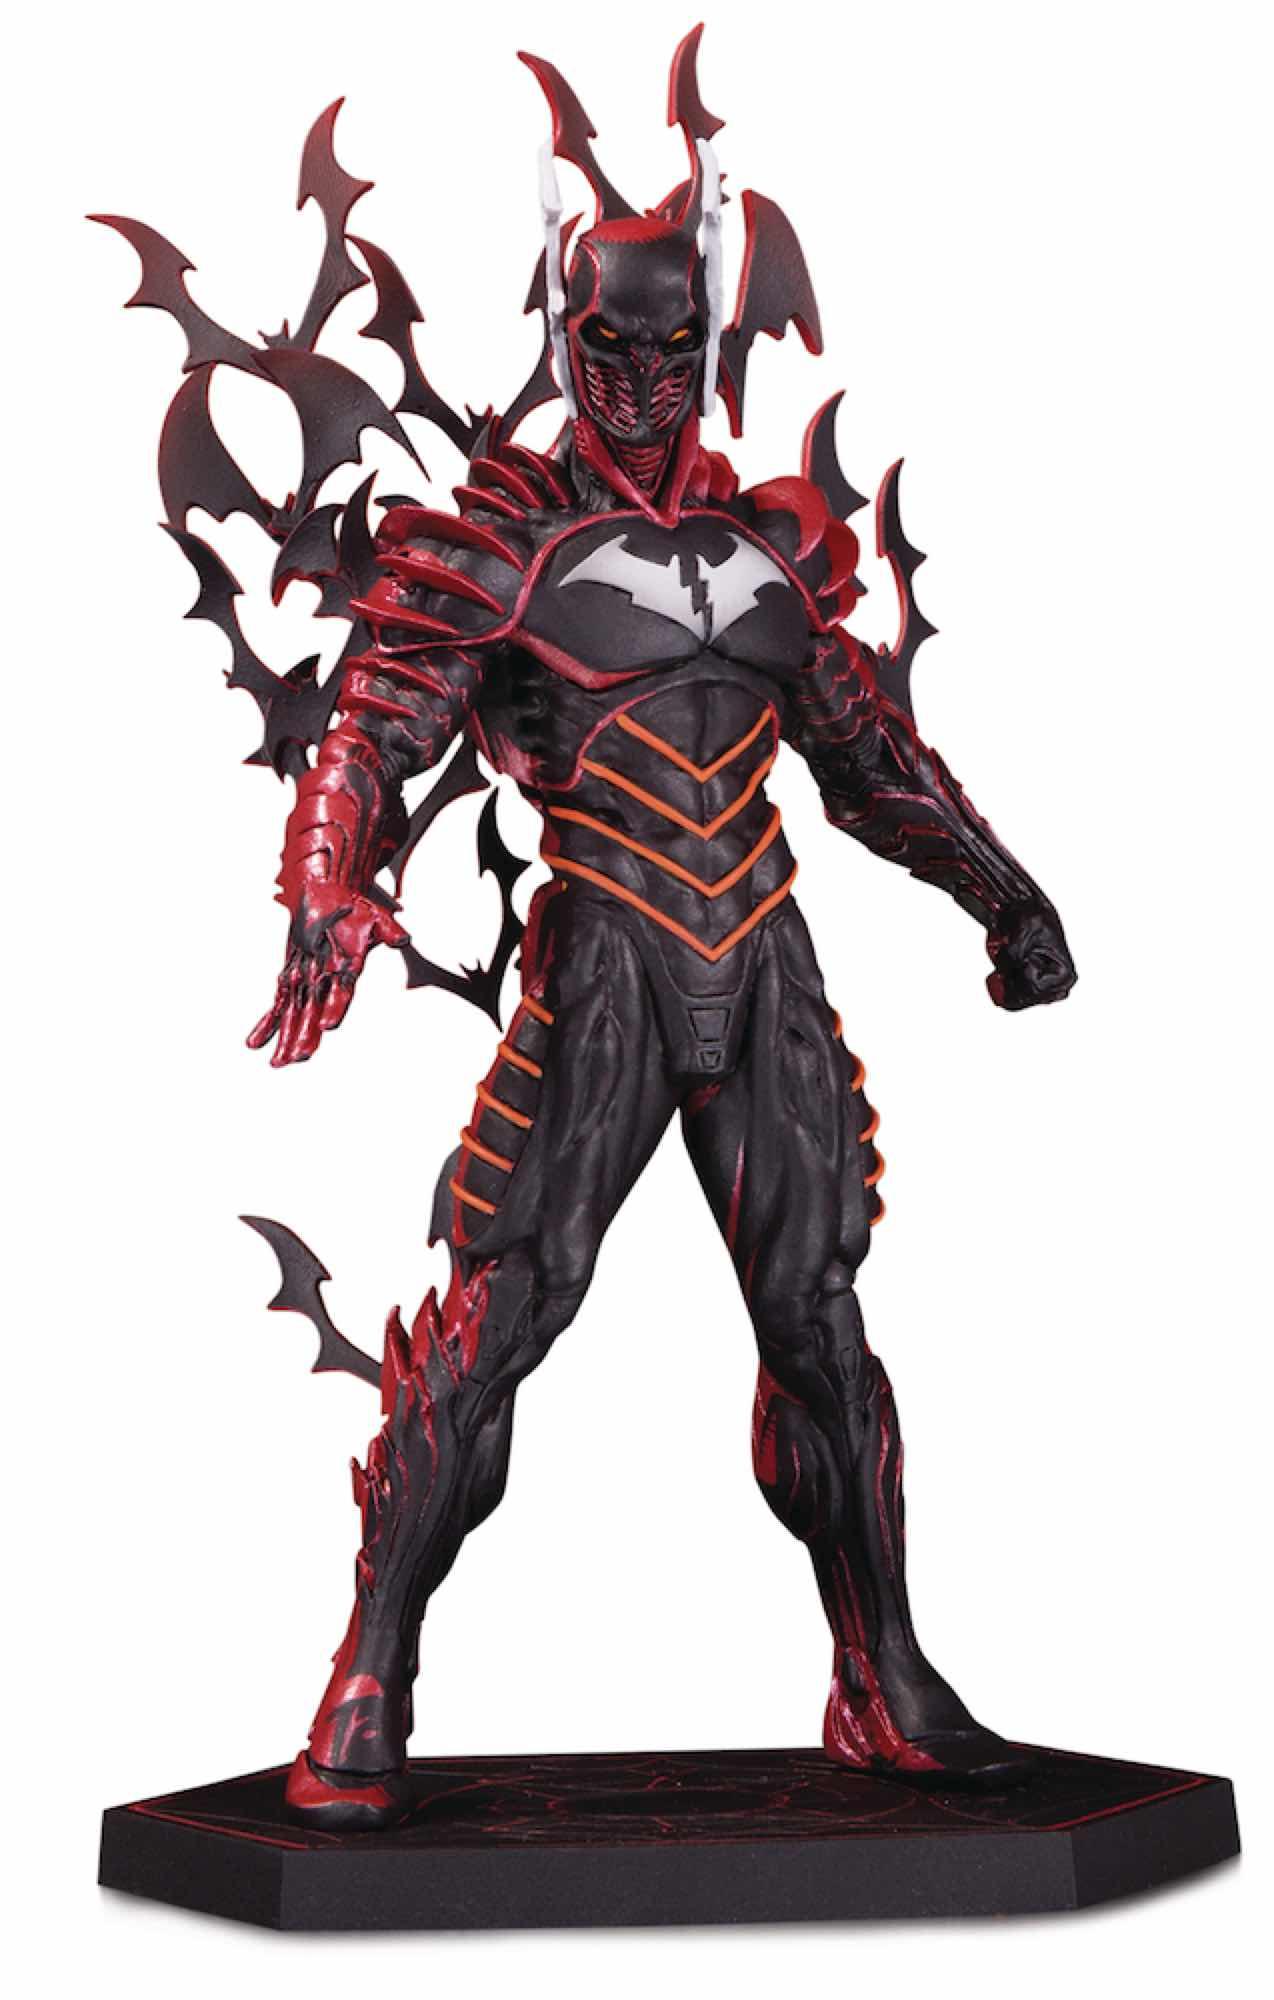 THE RED DEATH ESTATUA 21 CM DARK NIGHTS: METAL BATMAN UNIVERSO DC